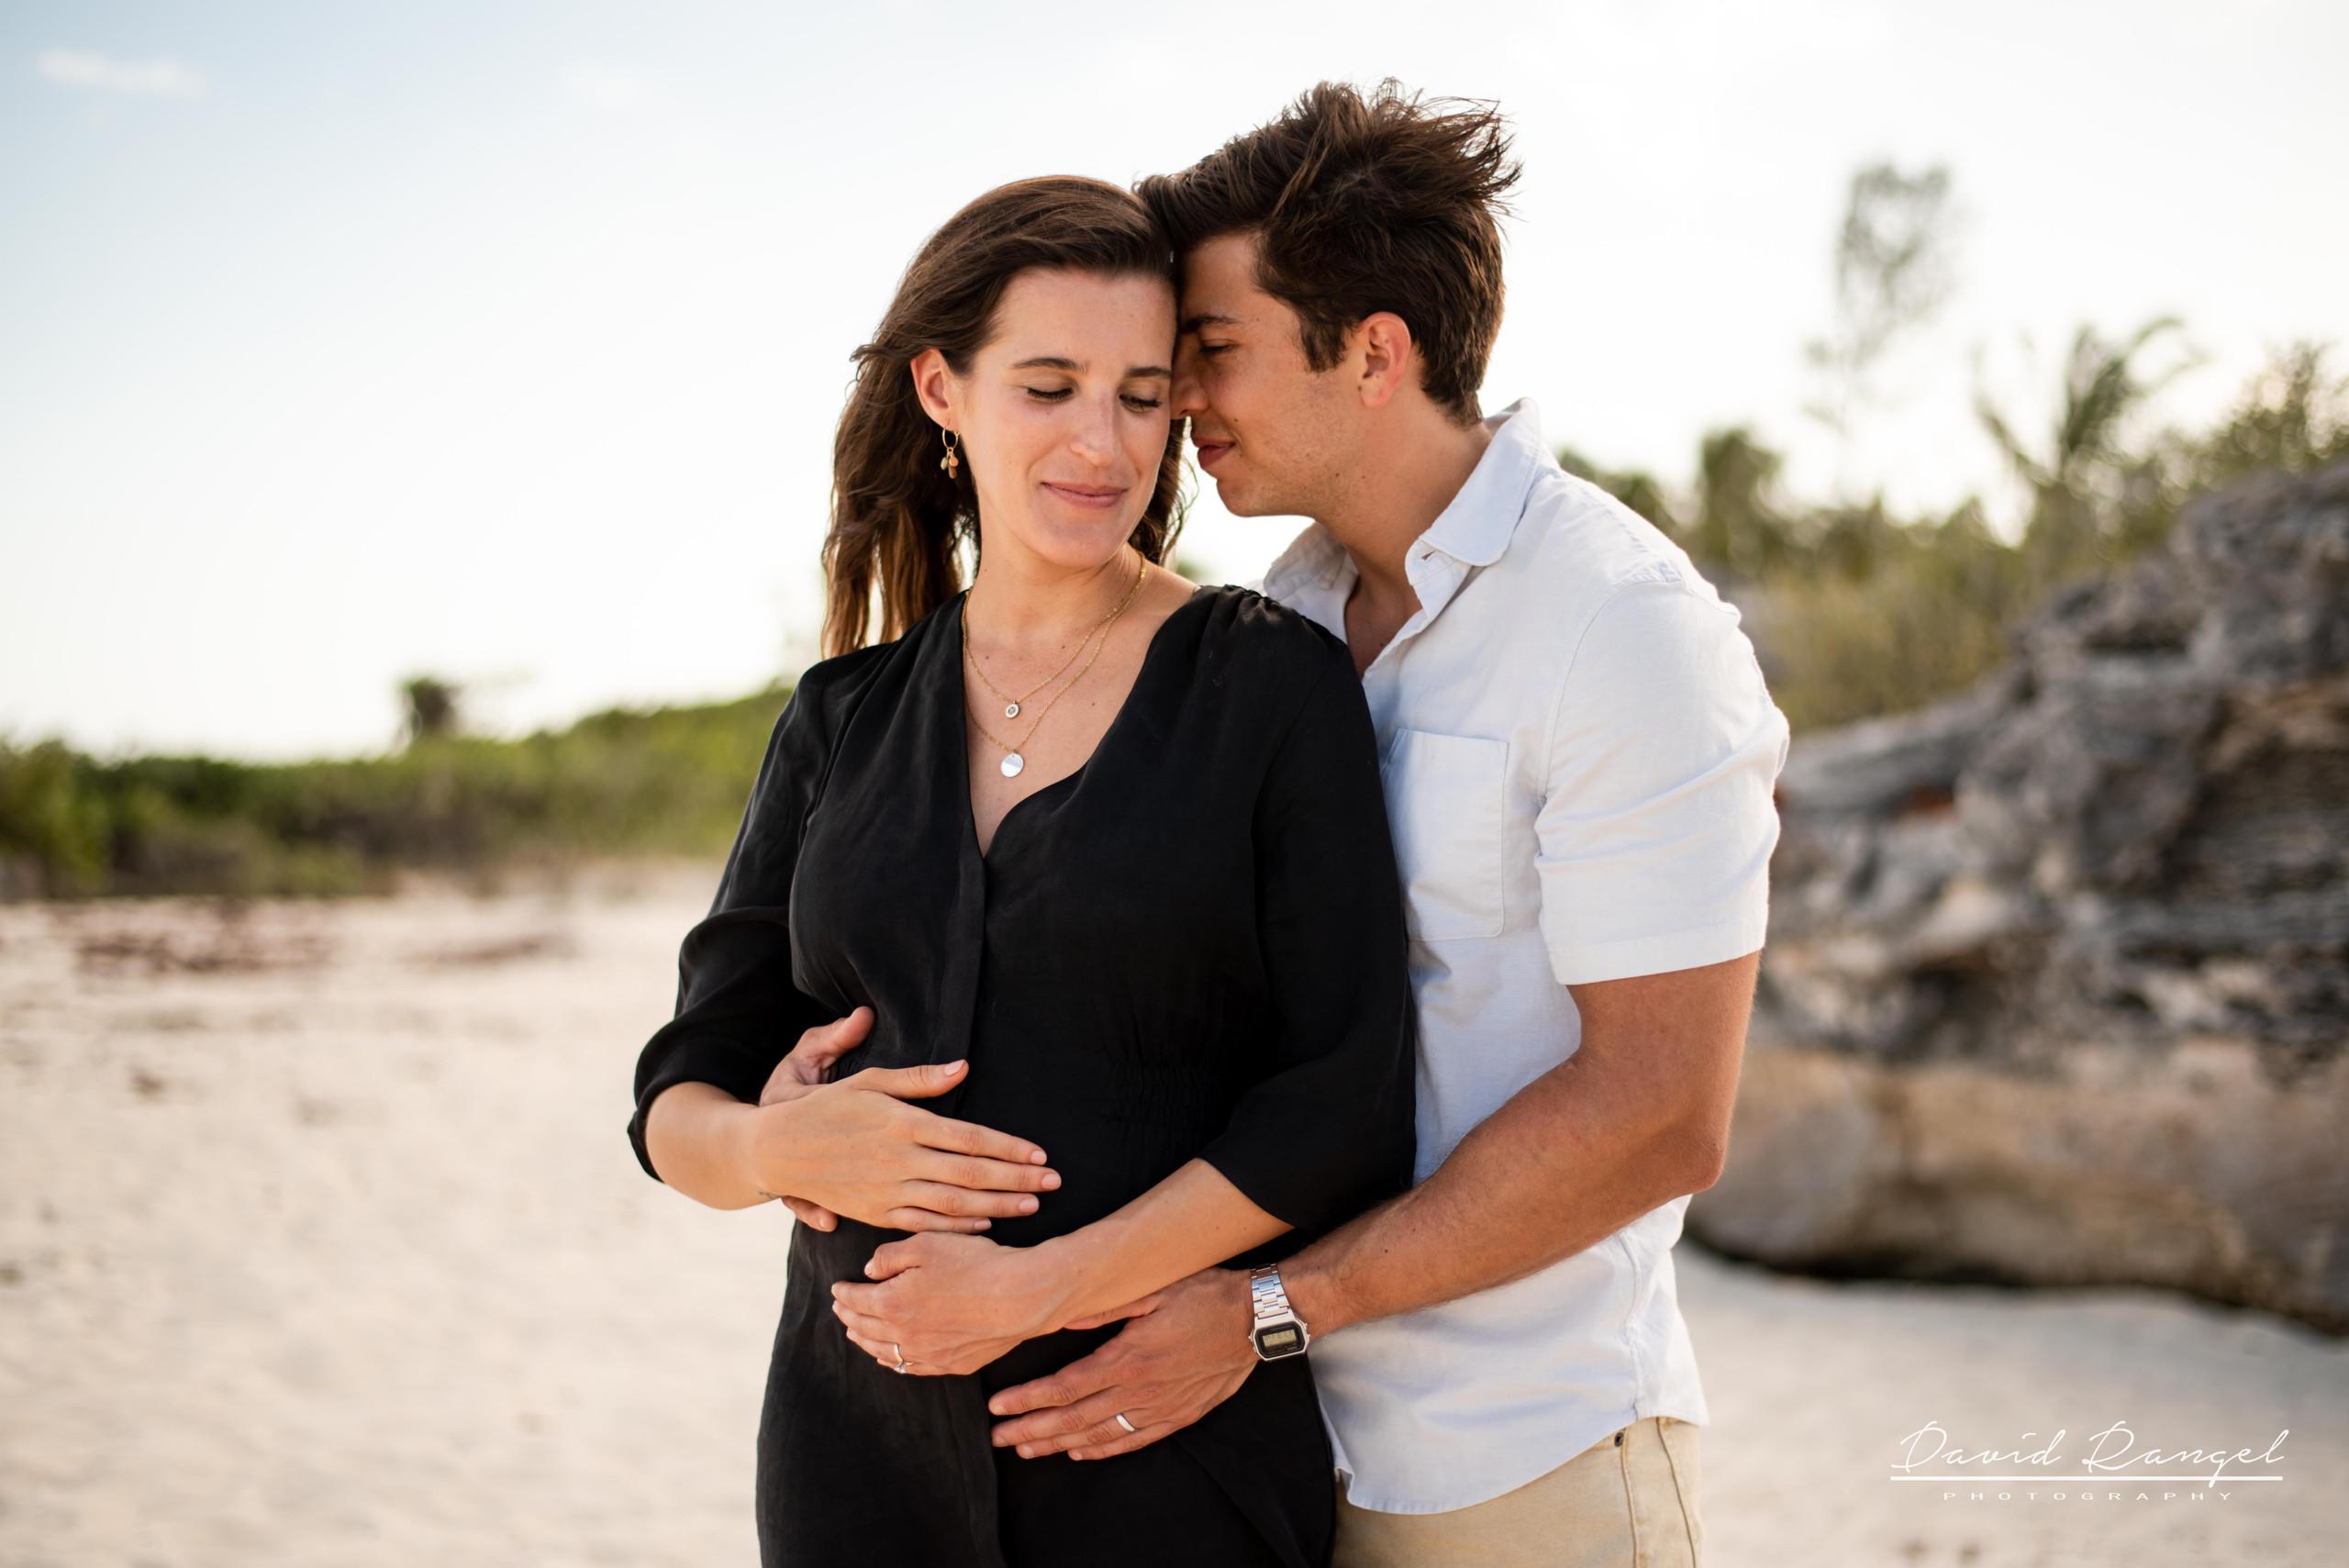 beach+session+riviera+maya+pregnancy+rocks+couple+future+mother+mom+father+love